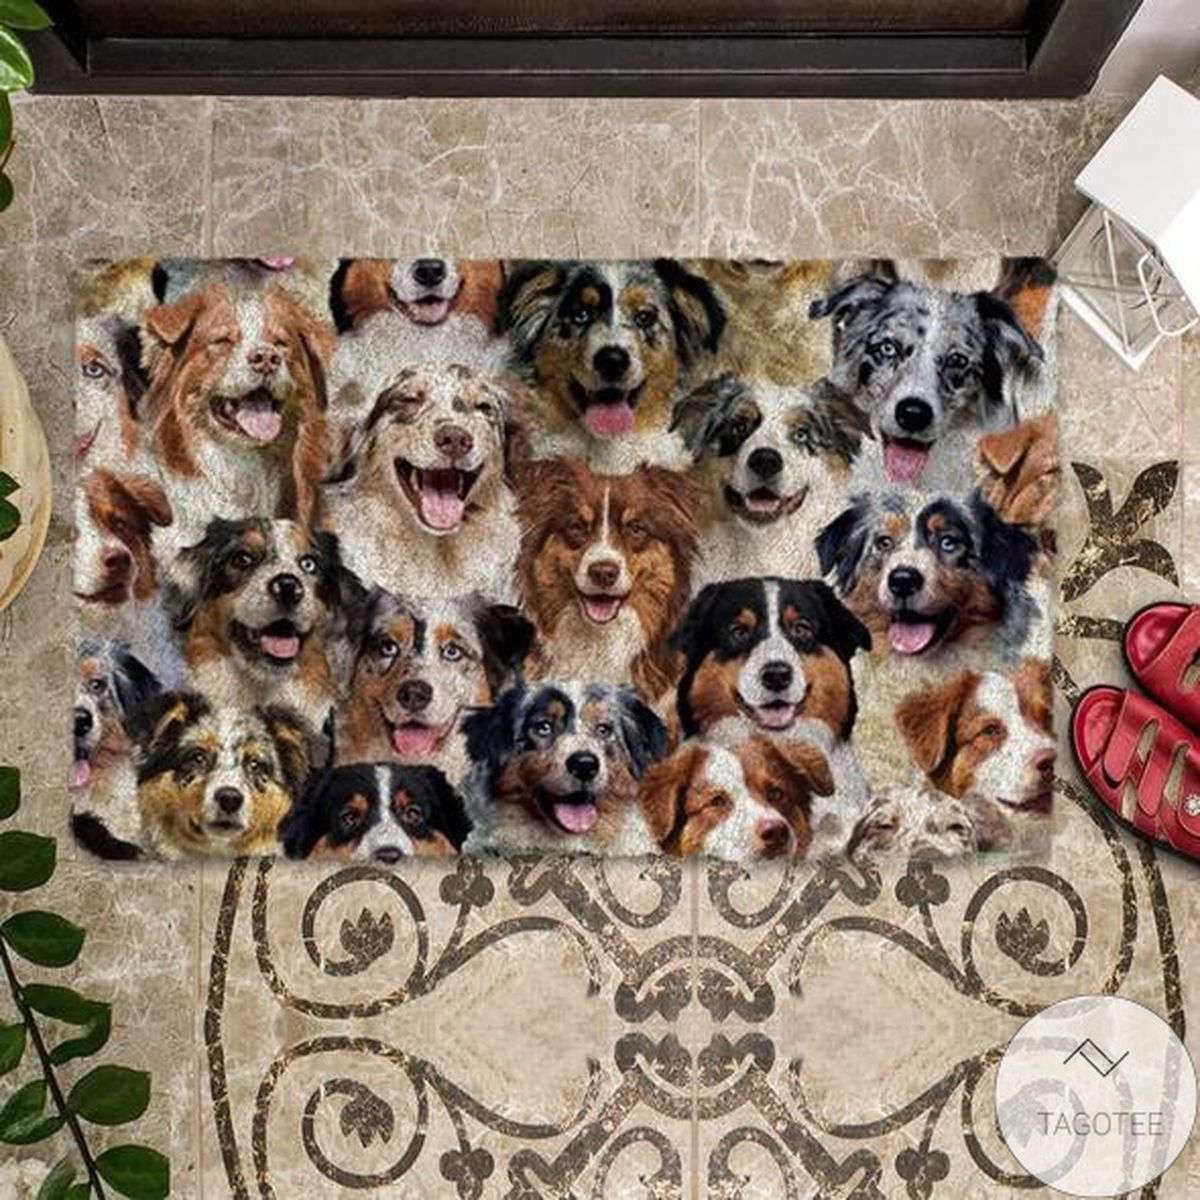 Free A Bunch Of Australian Shepherds Doormat